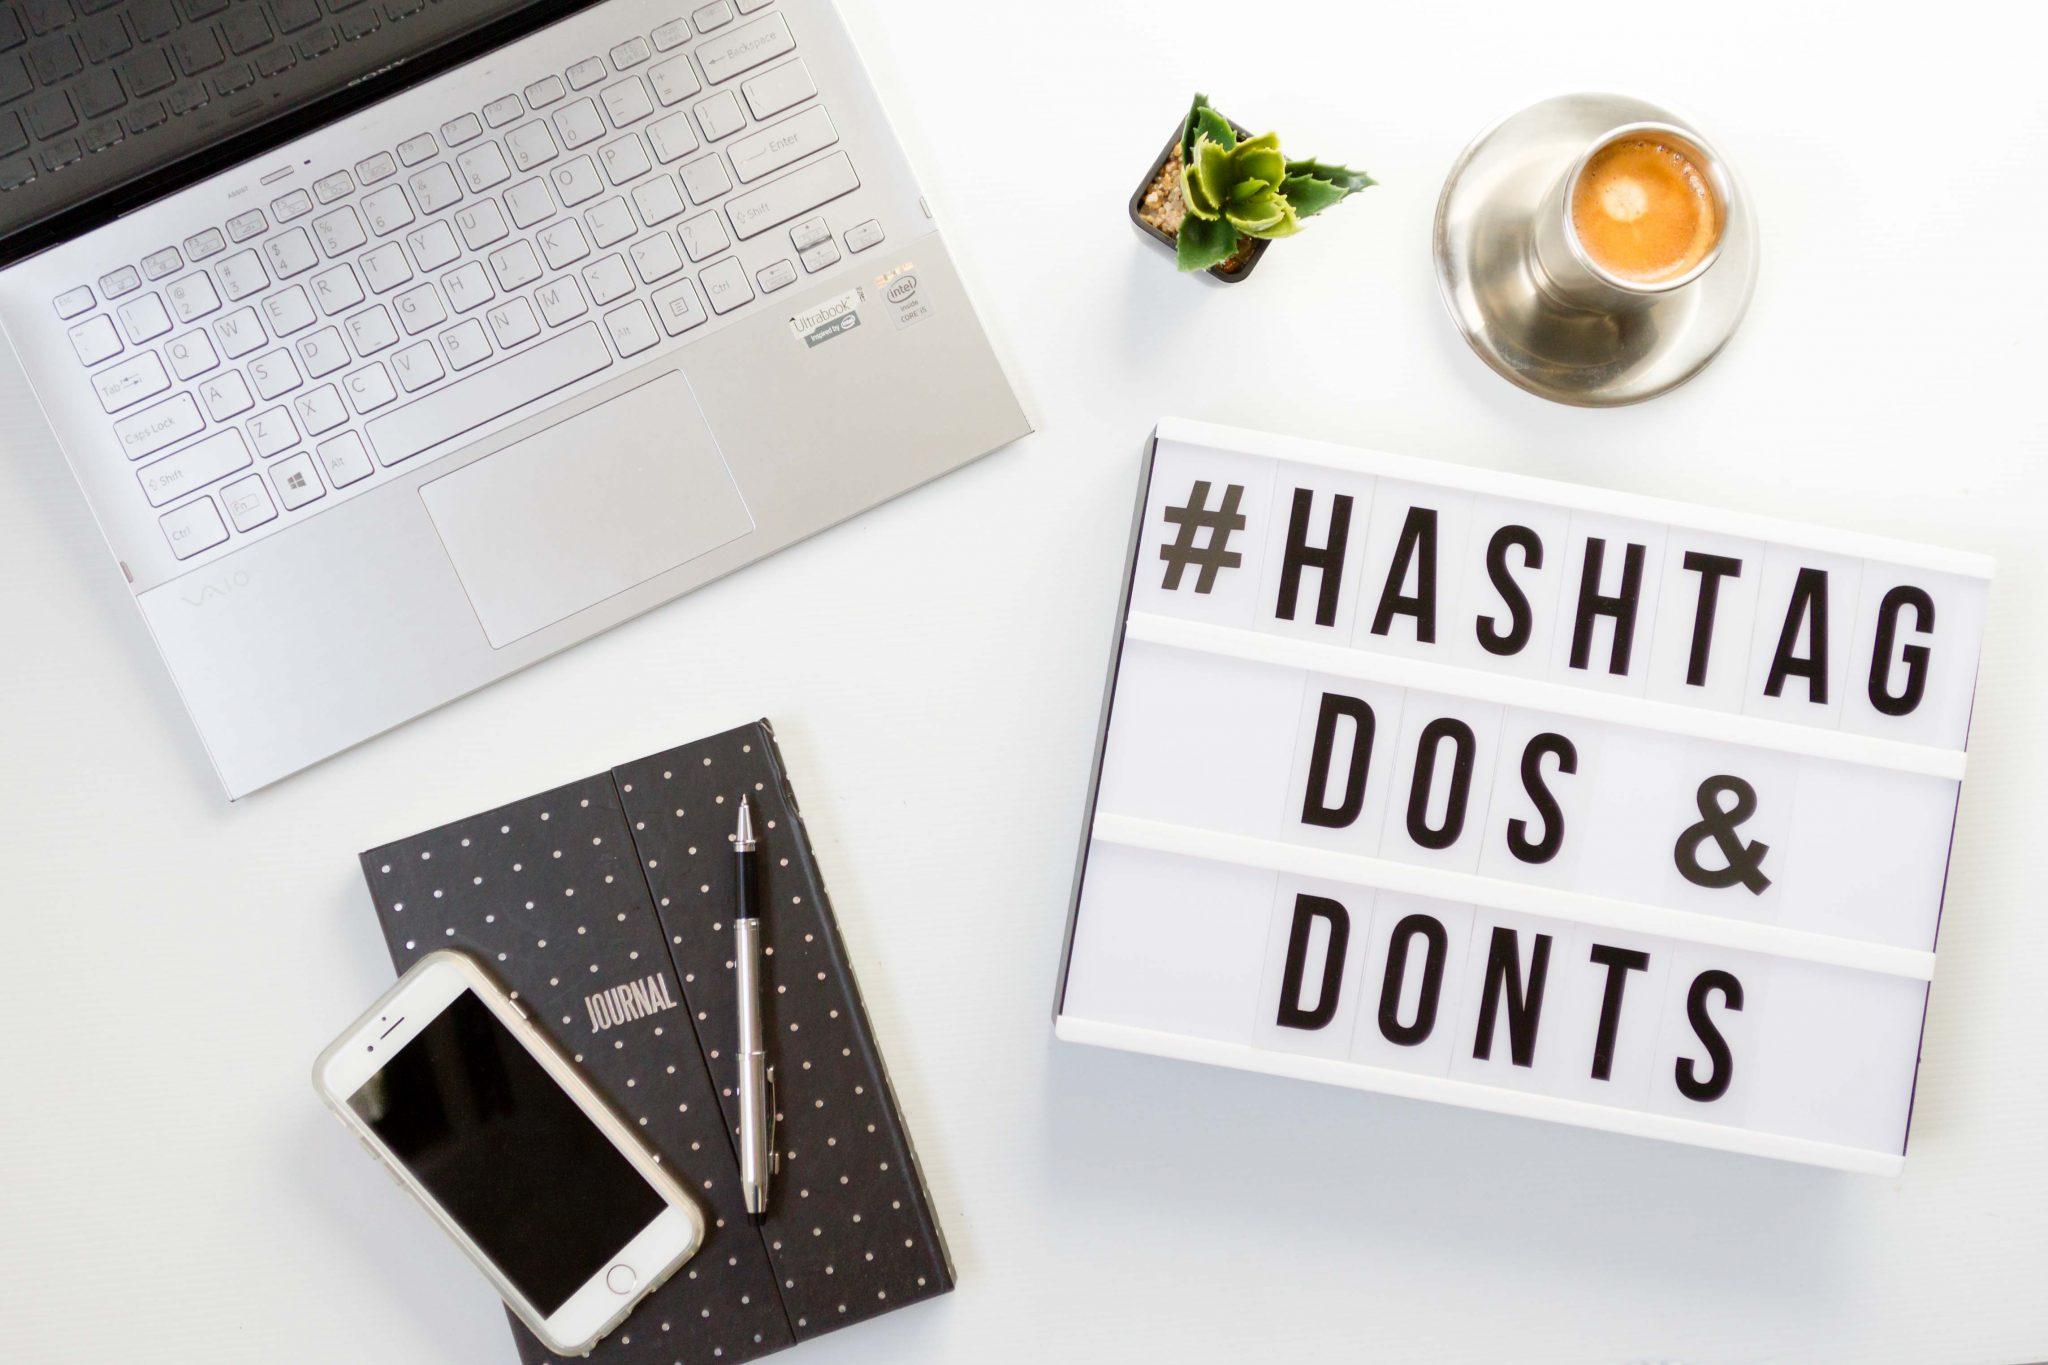 hashtags-2818